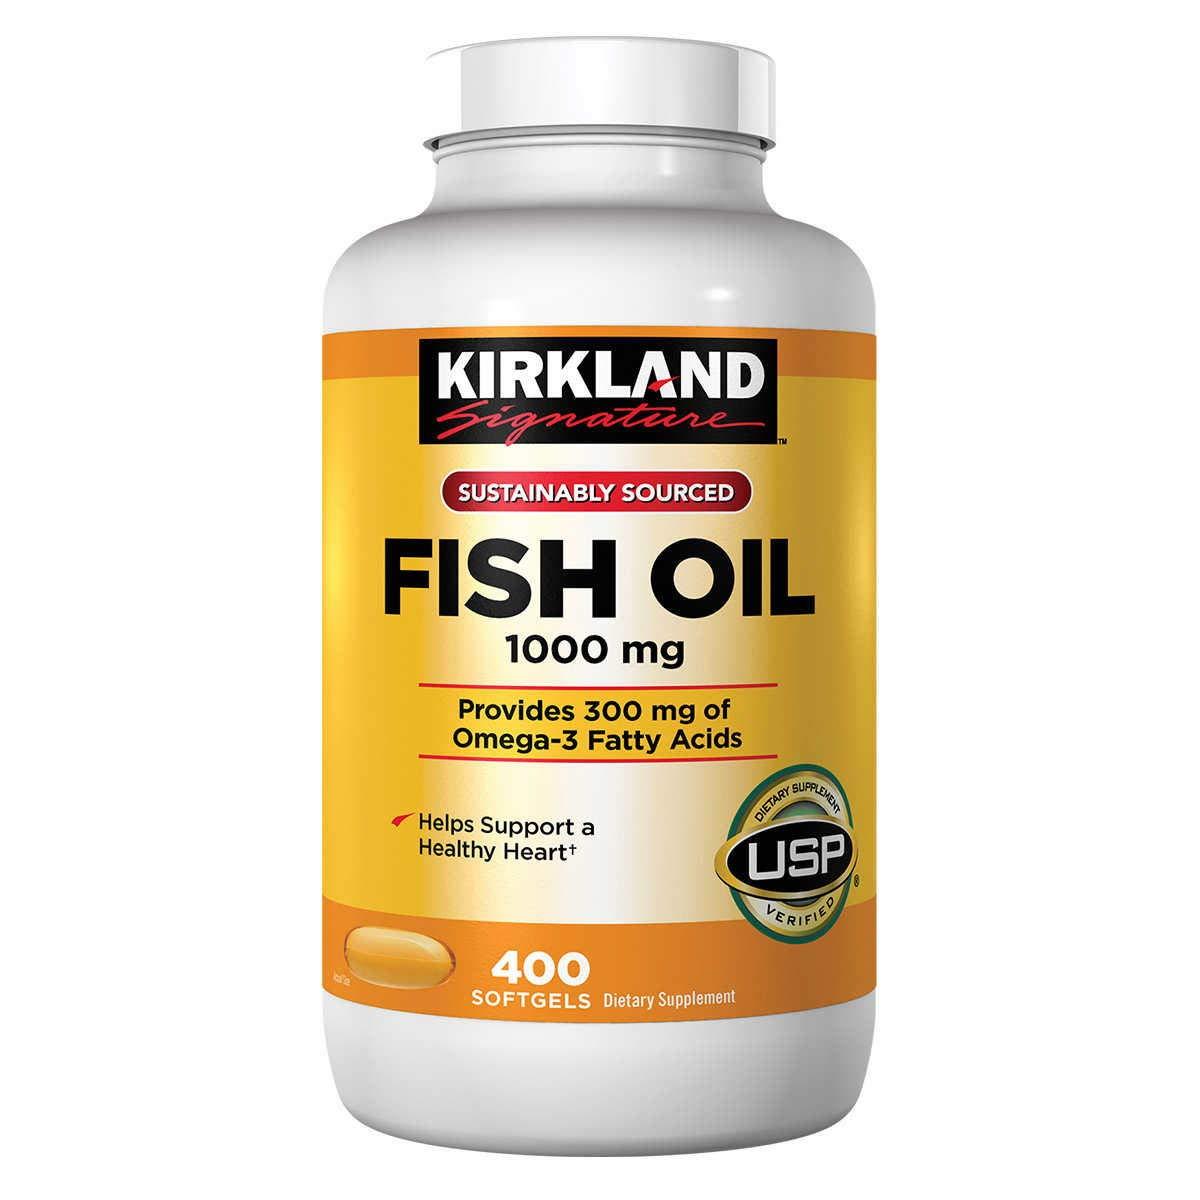 Kirkland Signature Omega 3 Fish Oil 1000 mg 400 Softgels by Kirkland